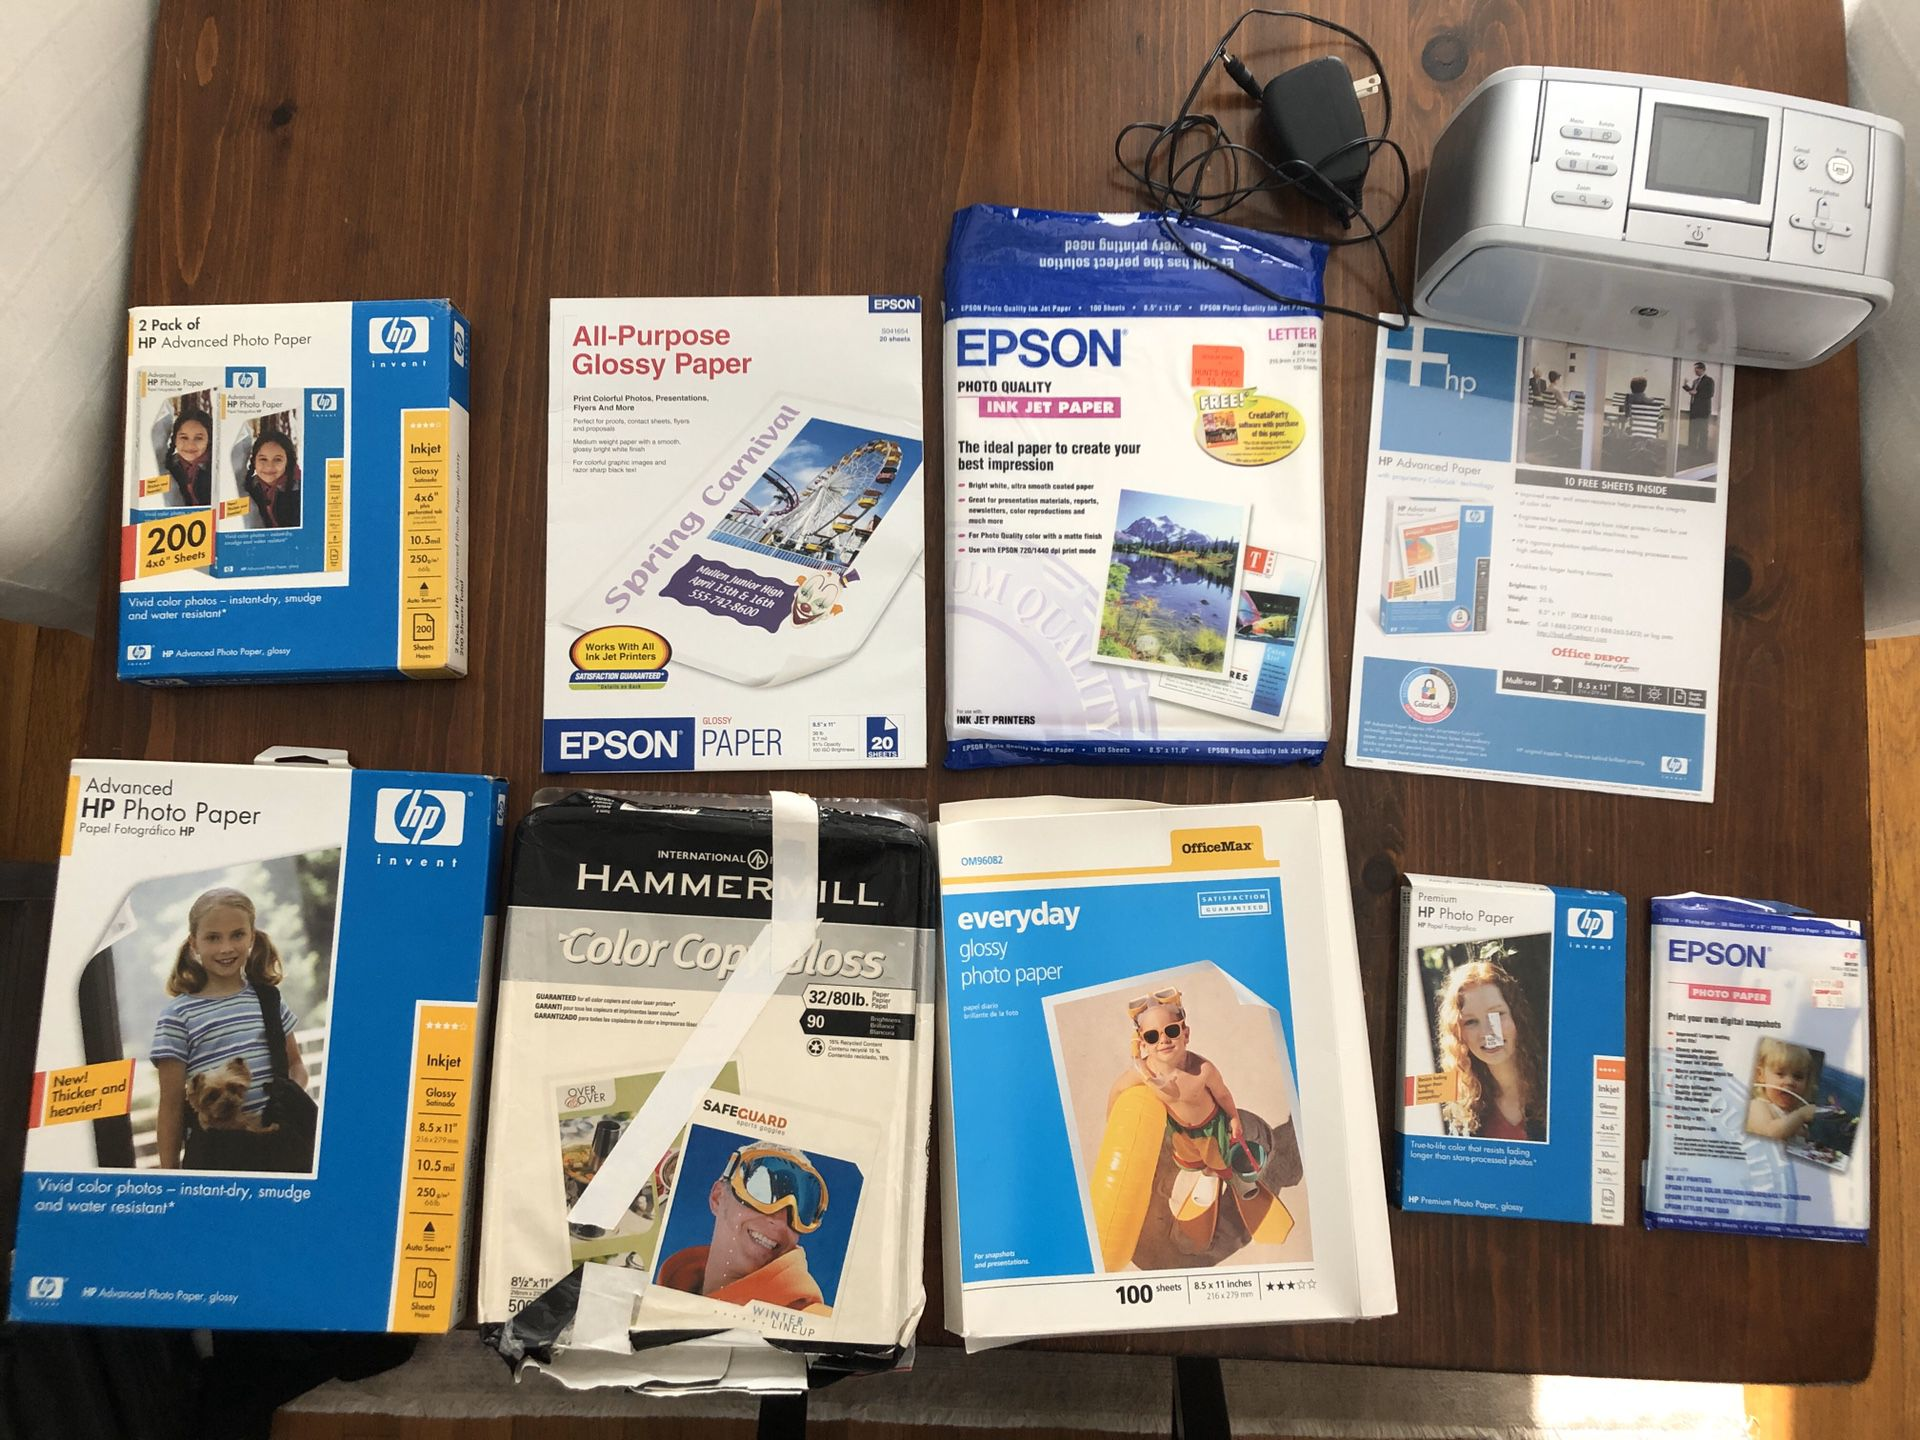 HP Photosmart 475 compact printer & mixed printer paper set